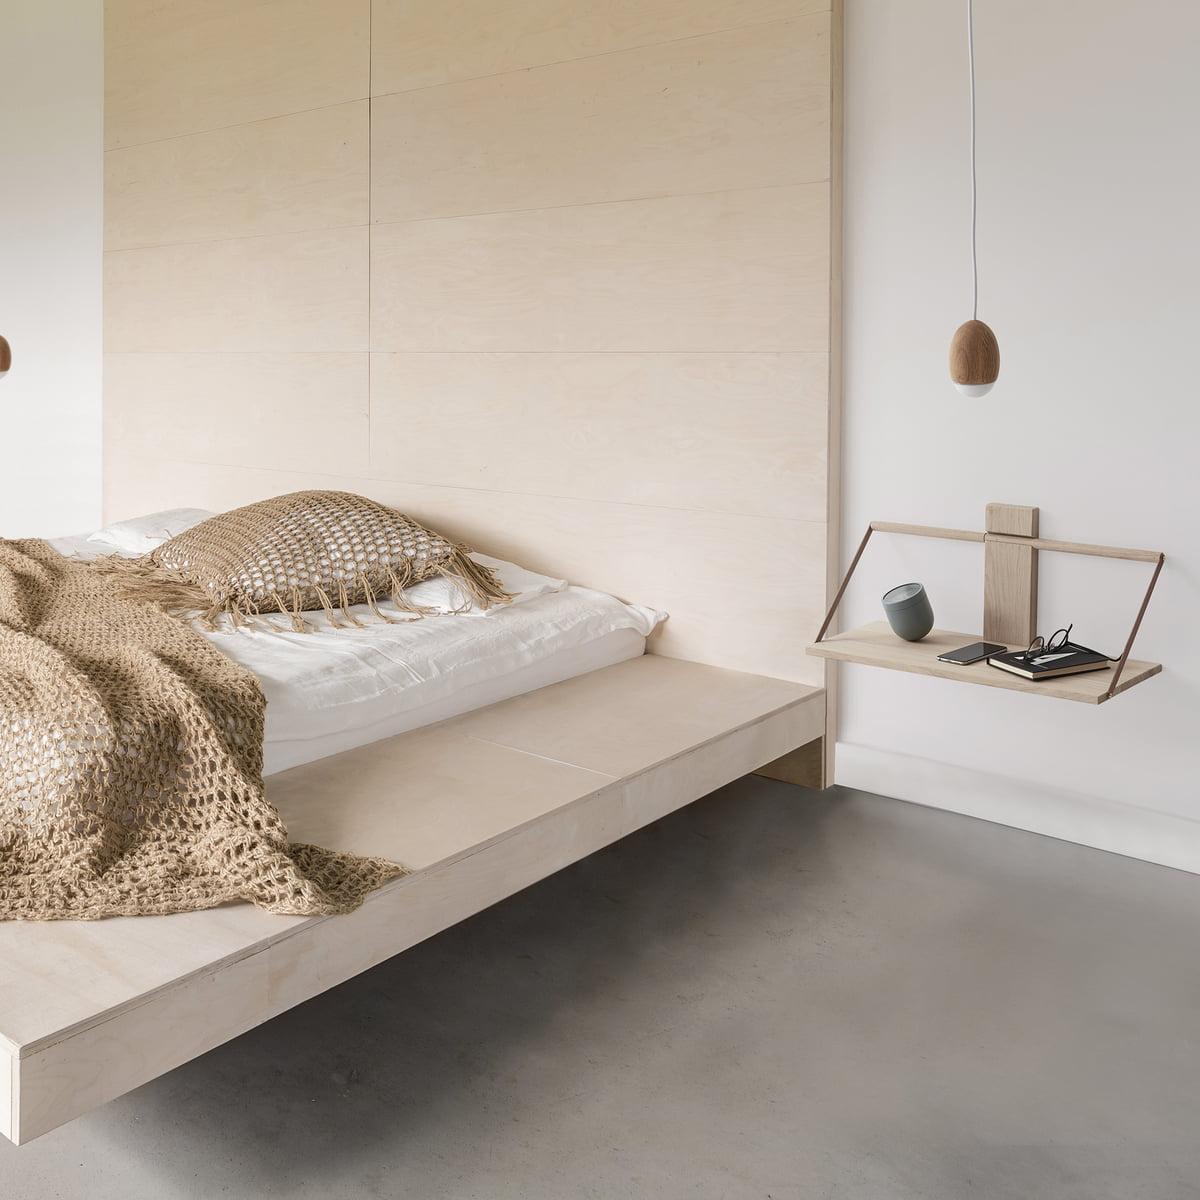 Full Size of Wood Wall Hngeregal Von Andersen Furniture Connox Stehlampe Schlafzimmer Blu Ray Regal Truhe Würfel Usm Haller Wandtattoo Betten Buche Günstig Wildeiche Schlafzimmer Schlafzimmer Regal